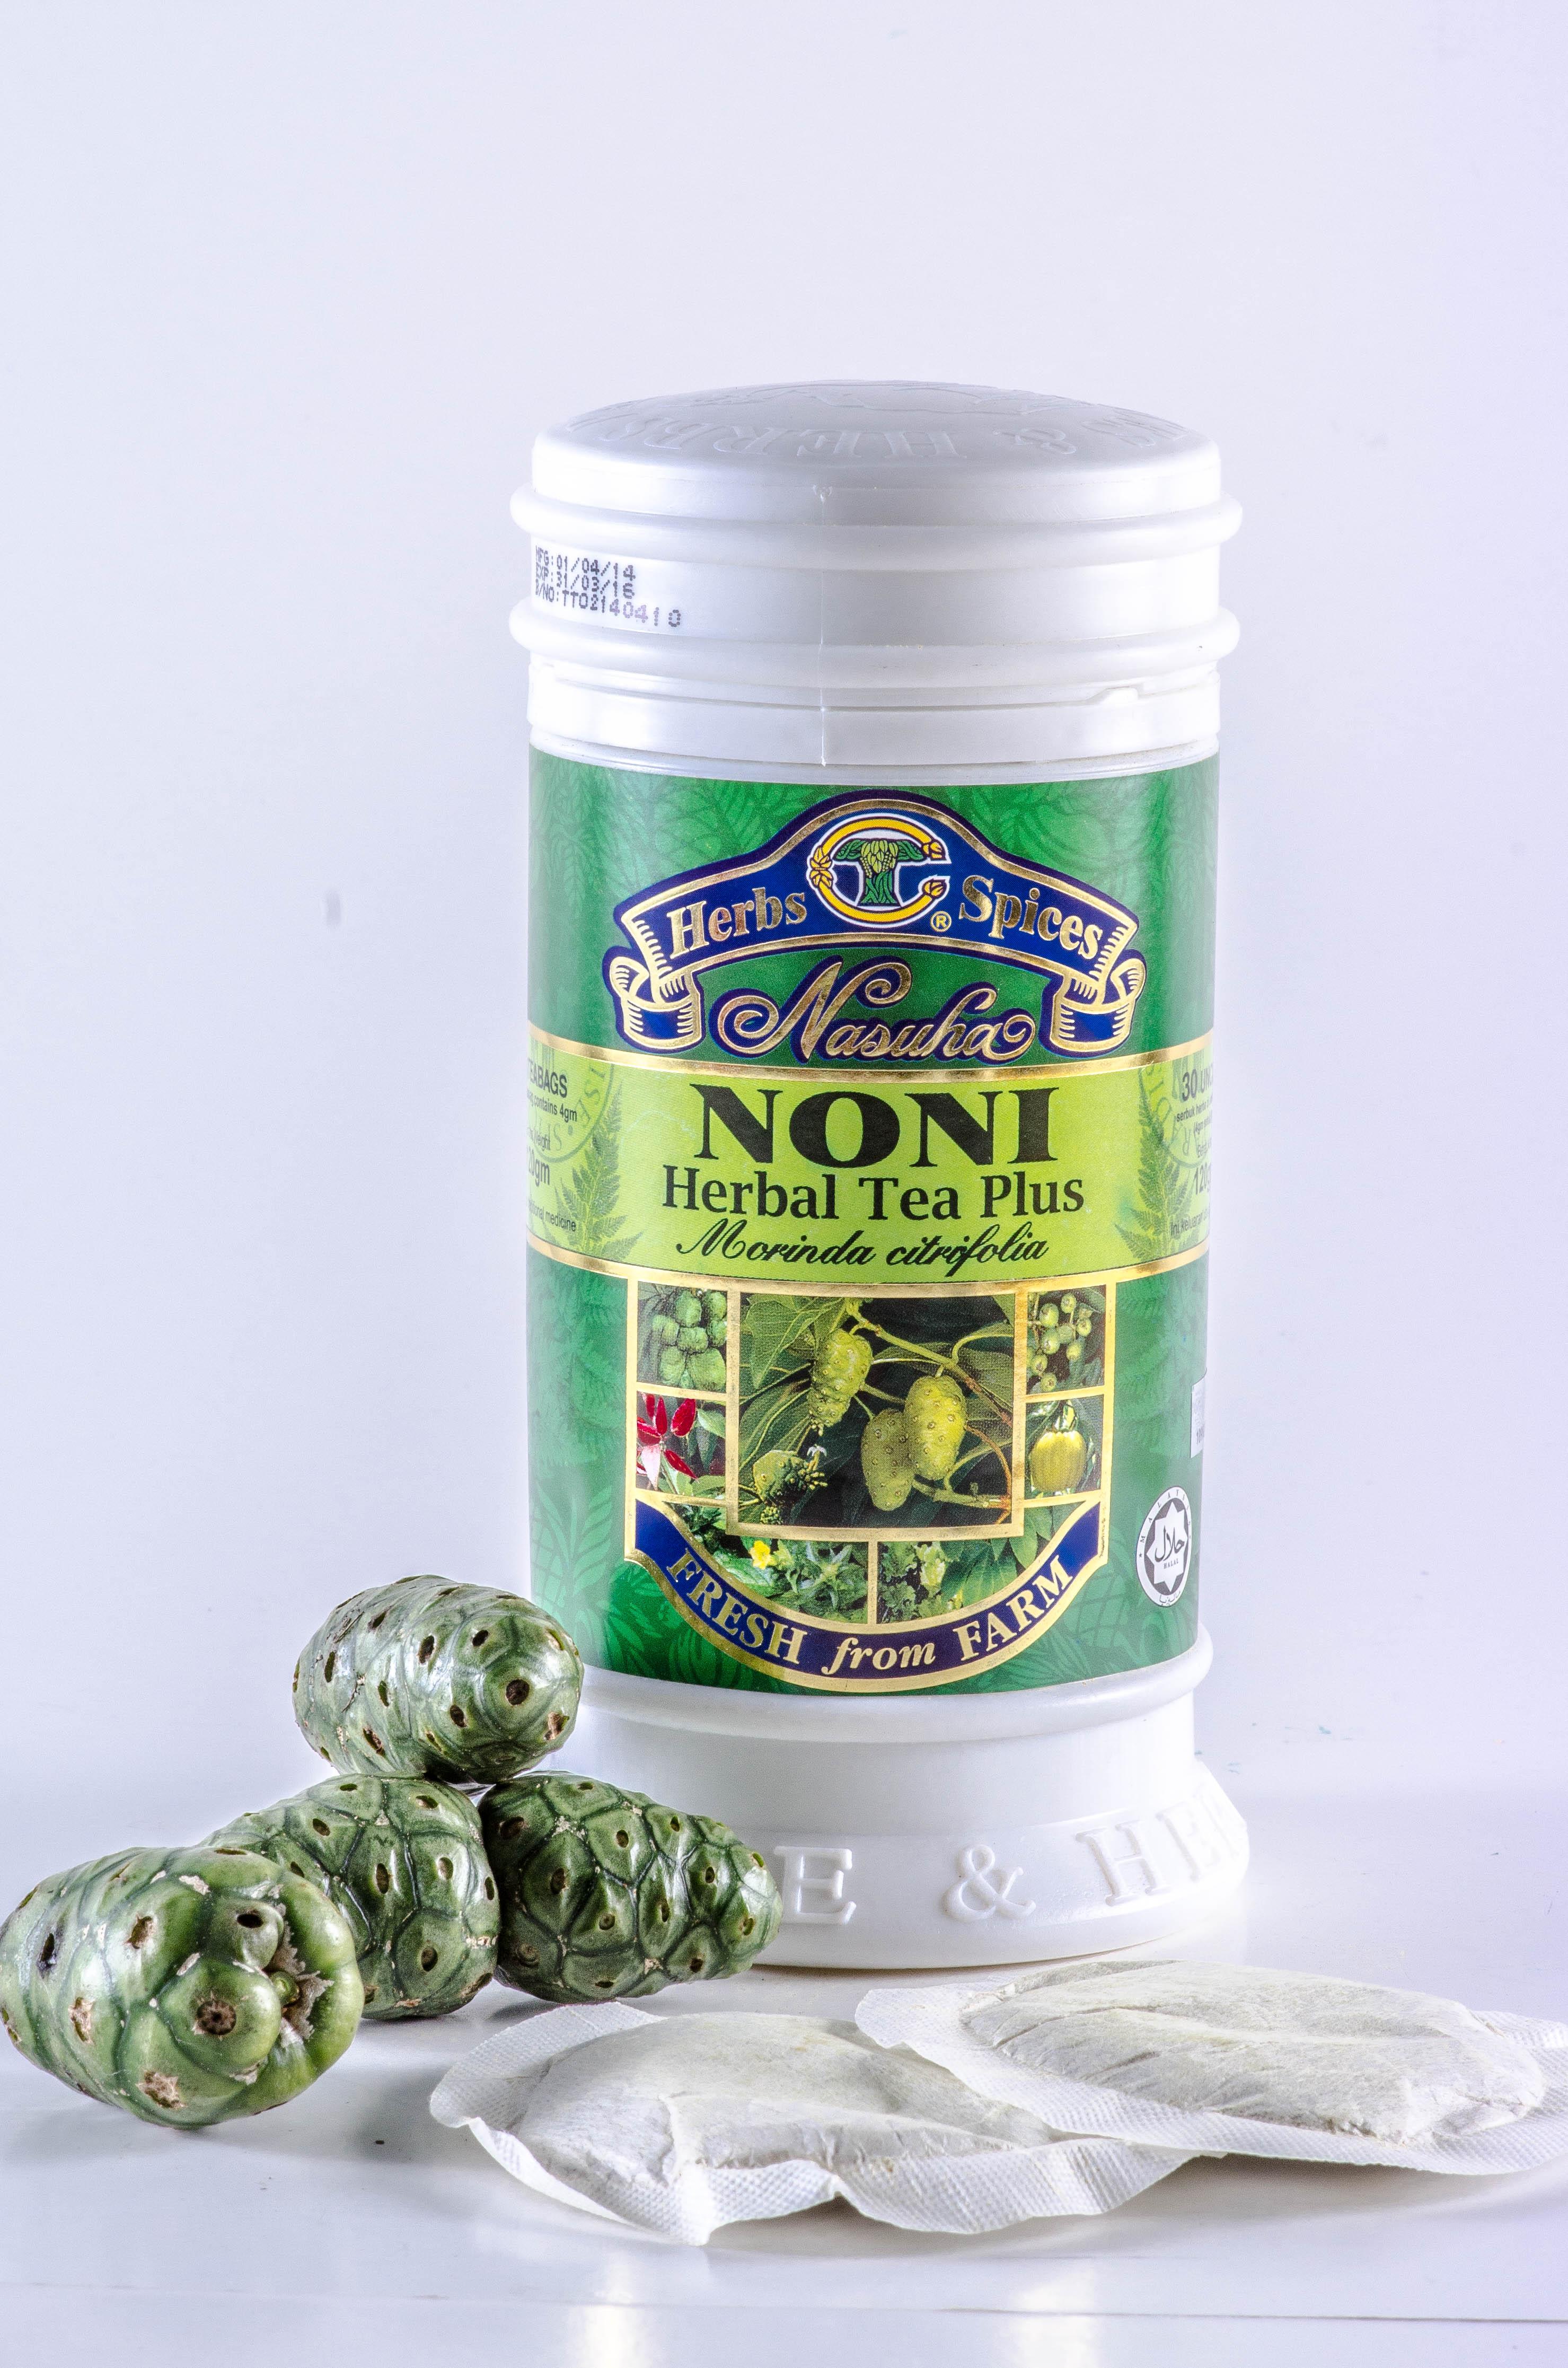 NONI HERBAL TEA